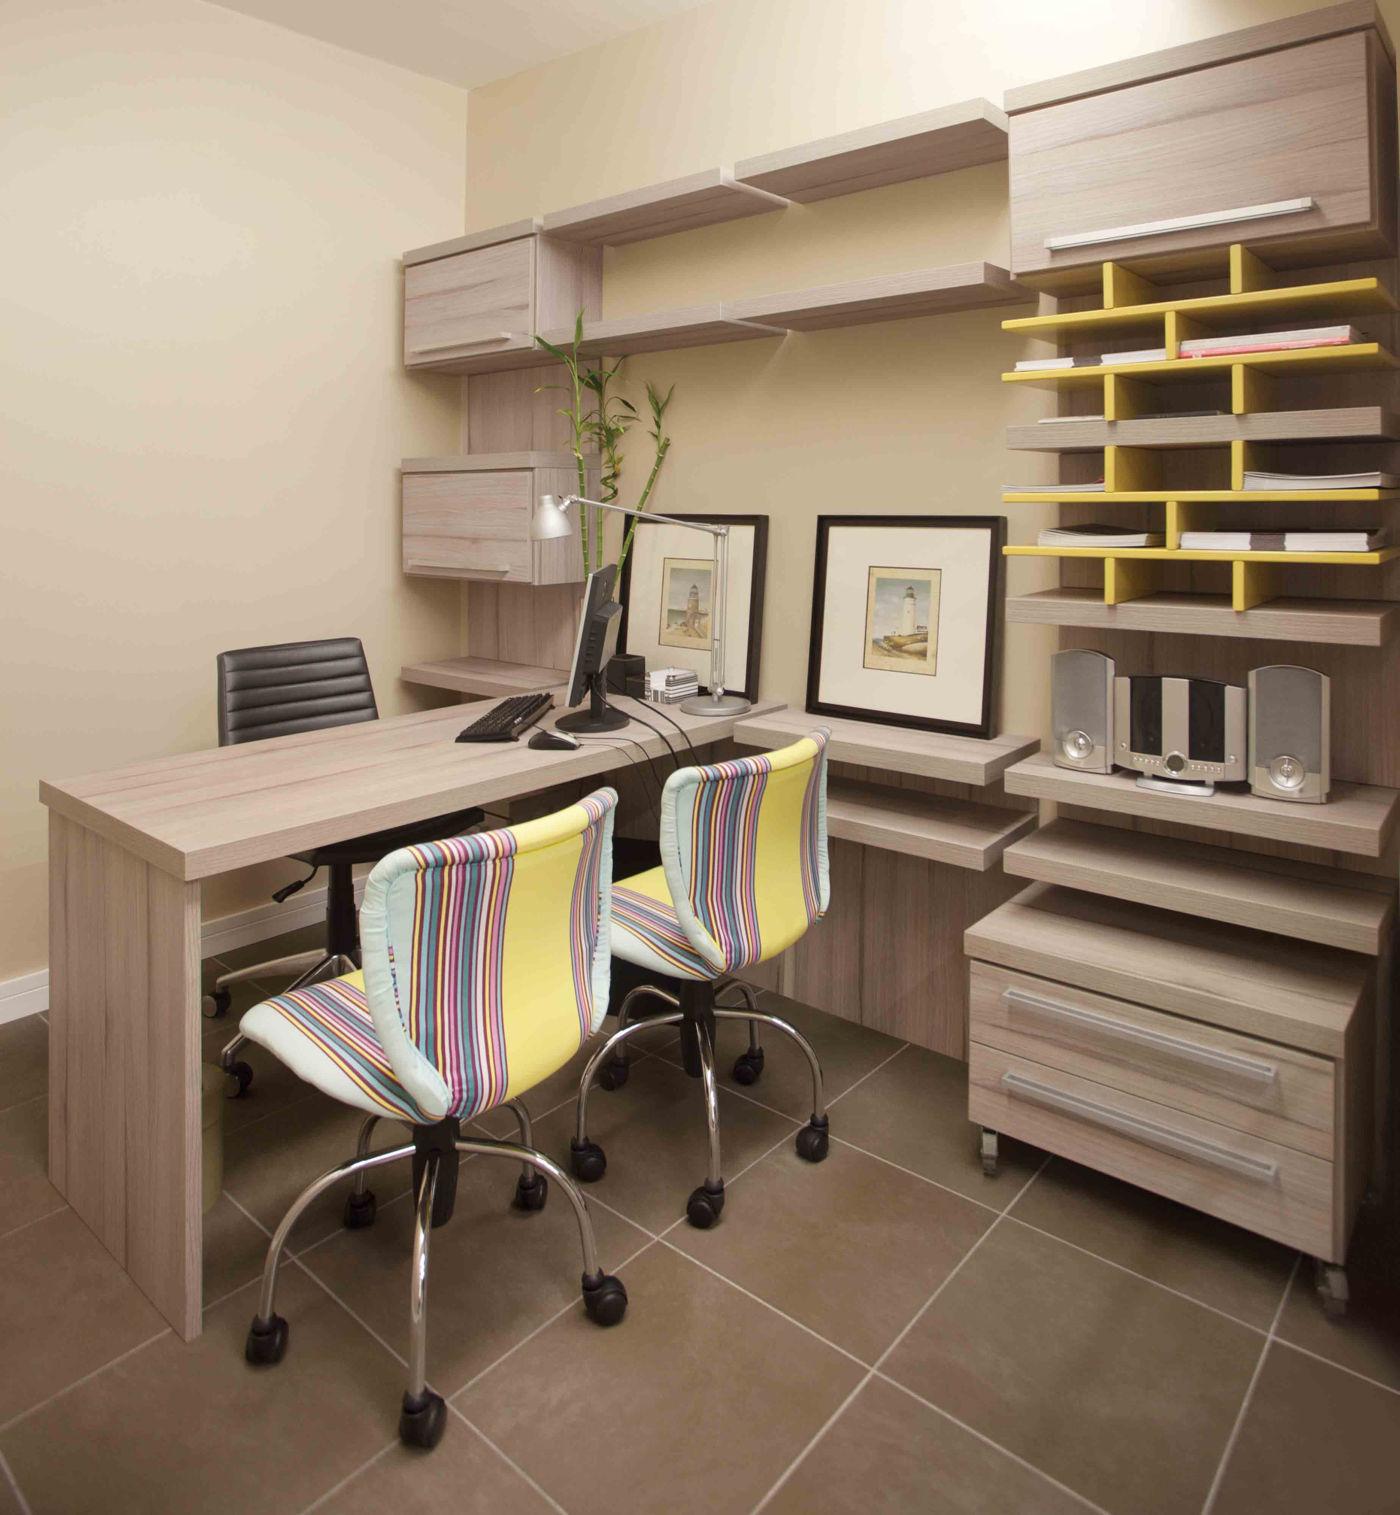 Home Office Como compor o ambiente  CDT Incorporaes